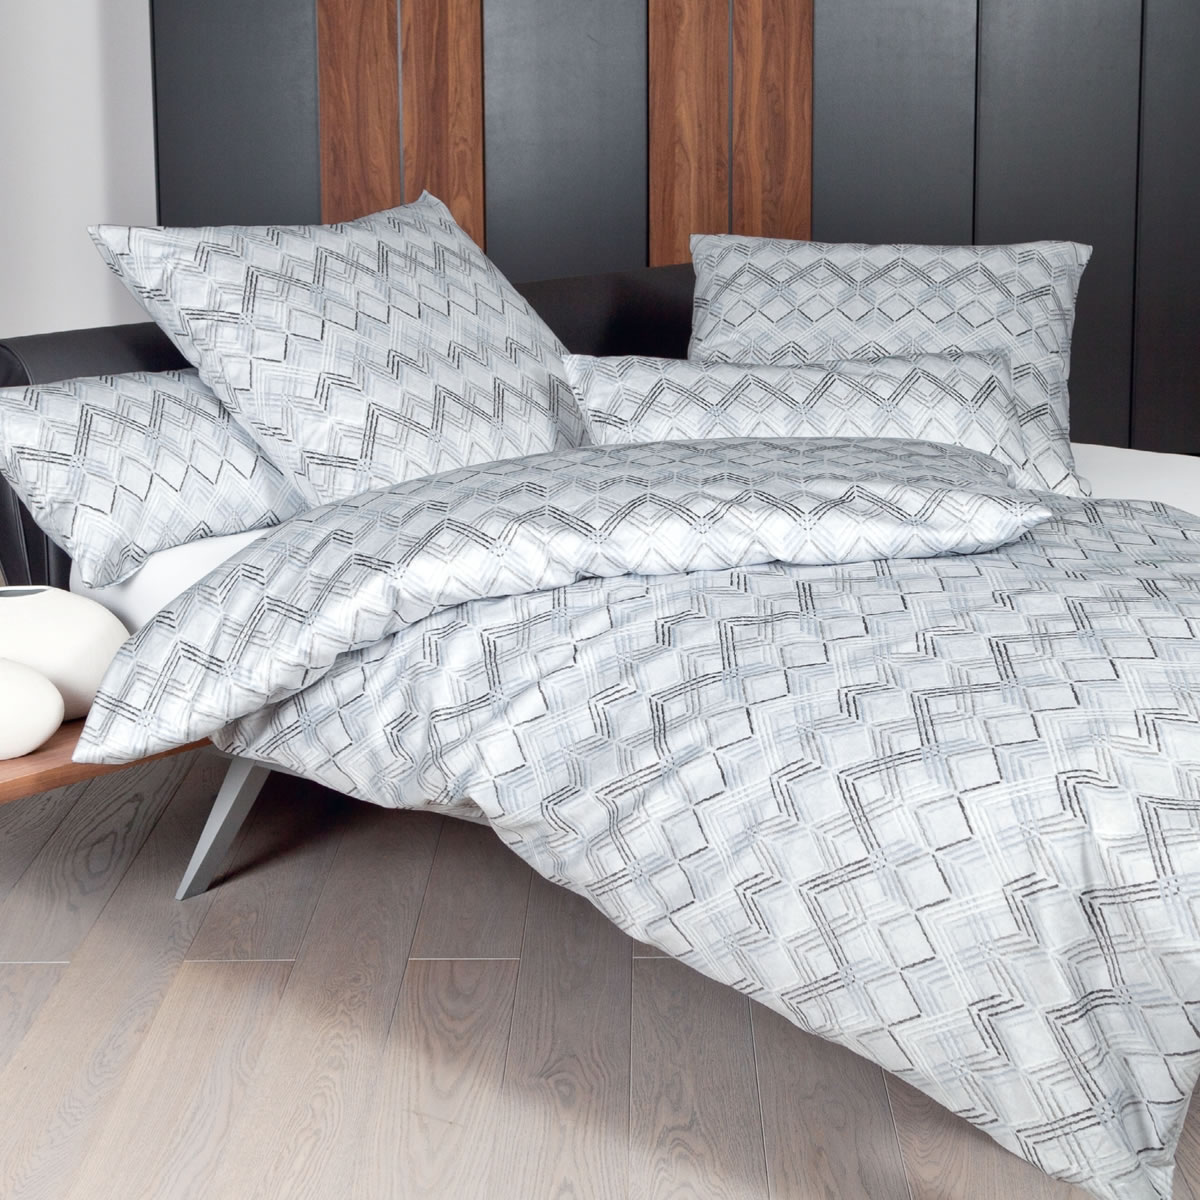 bettwsche silbergrau elegant jerymood mf jersey interlock bettwsche orchideen einzelbett tlg. Black Bedroom Furniture Sets. Home Design Ideas